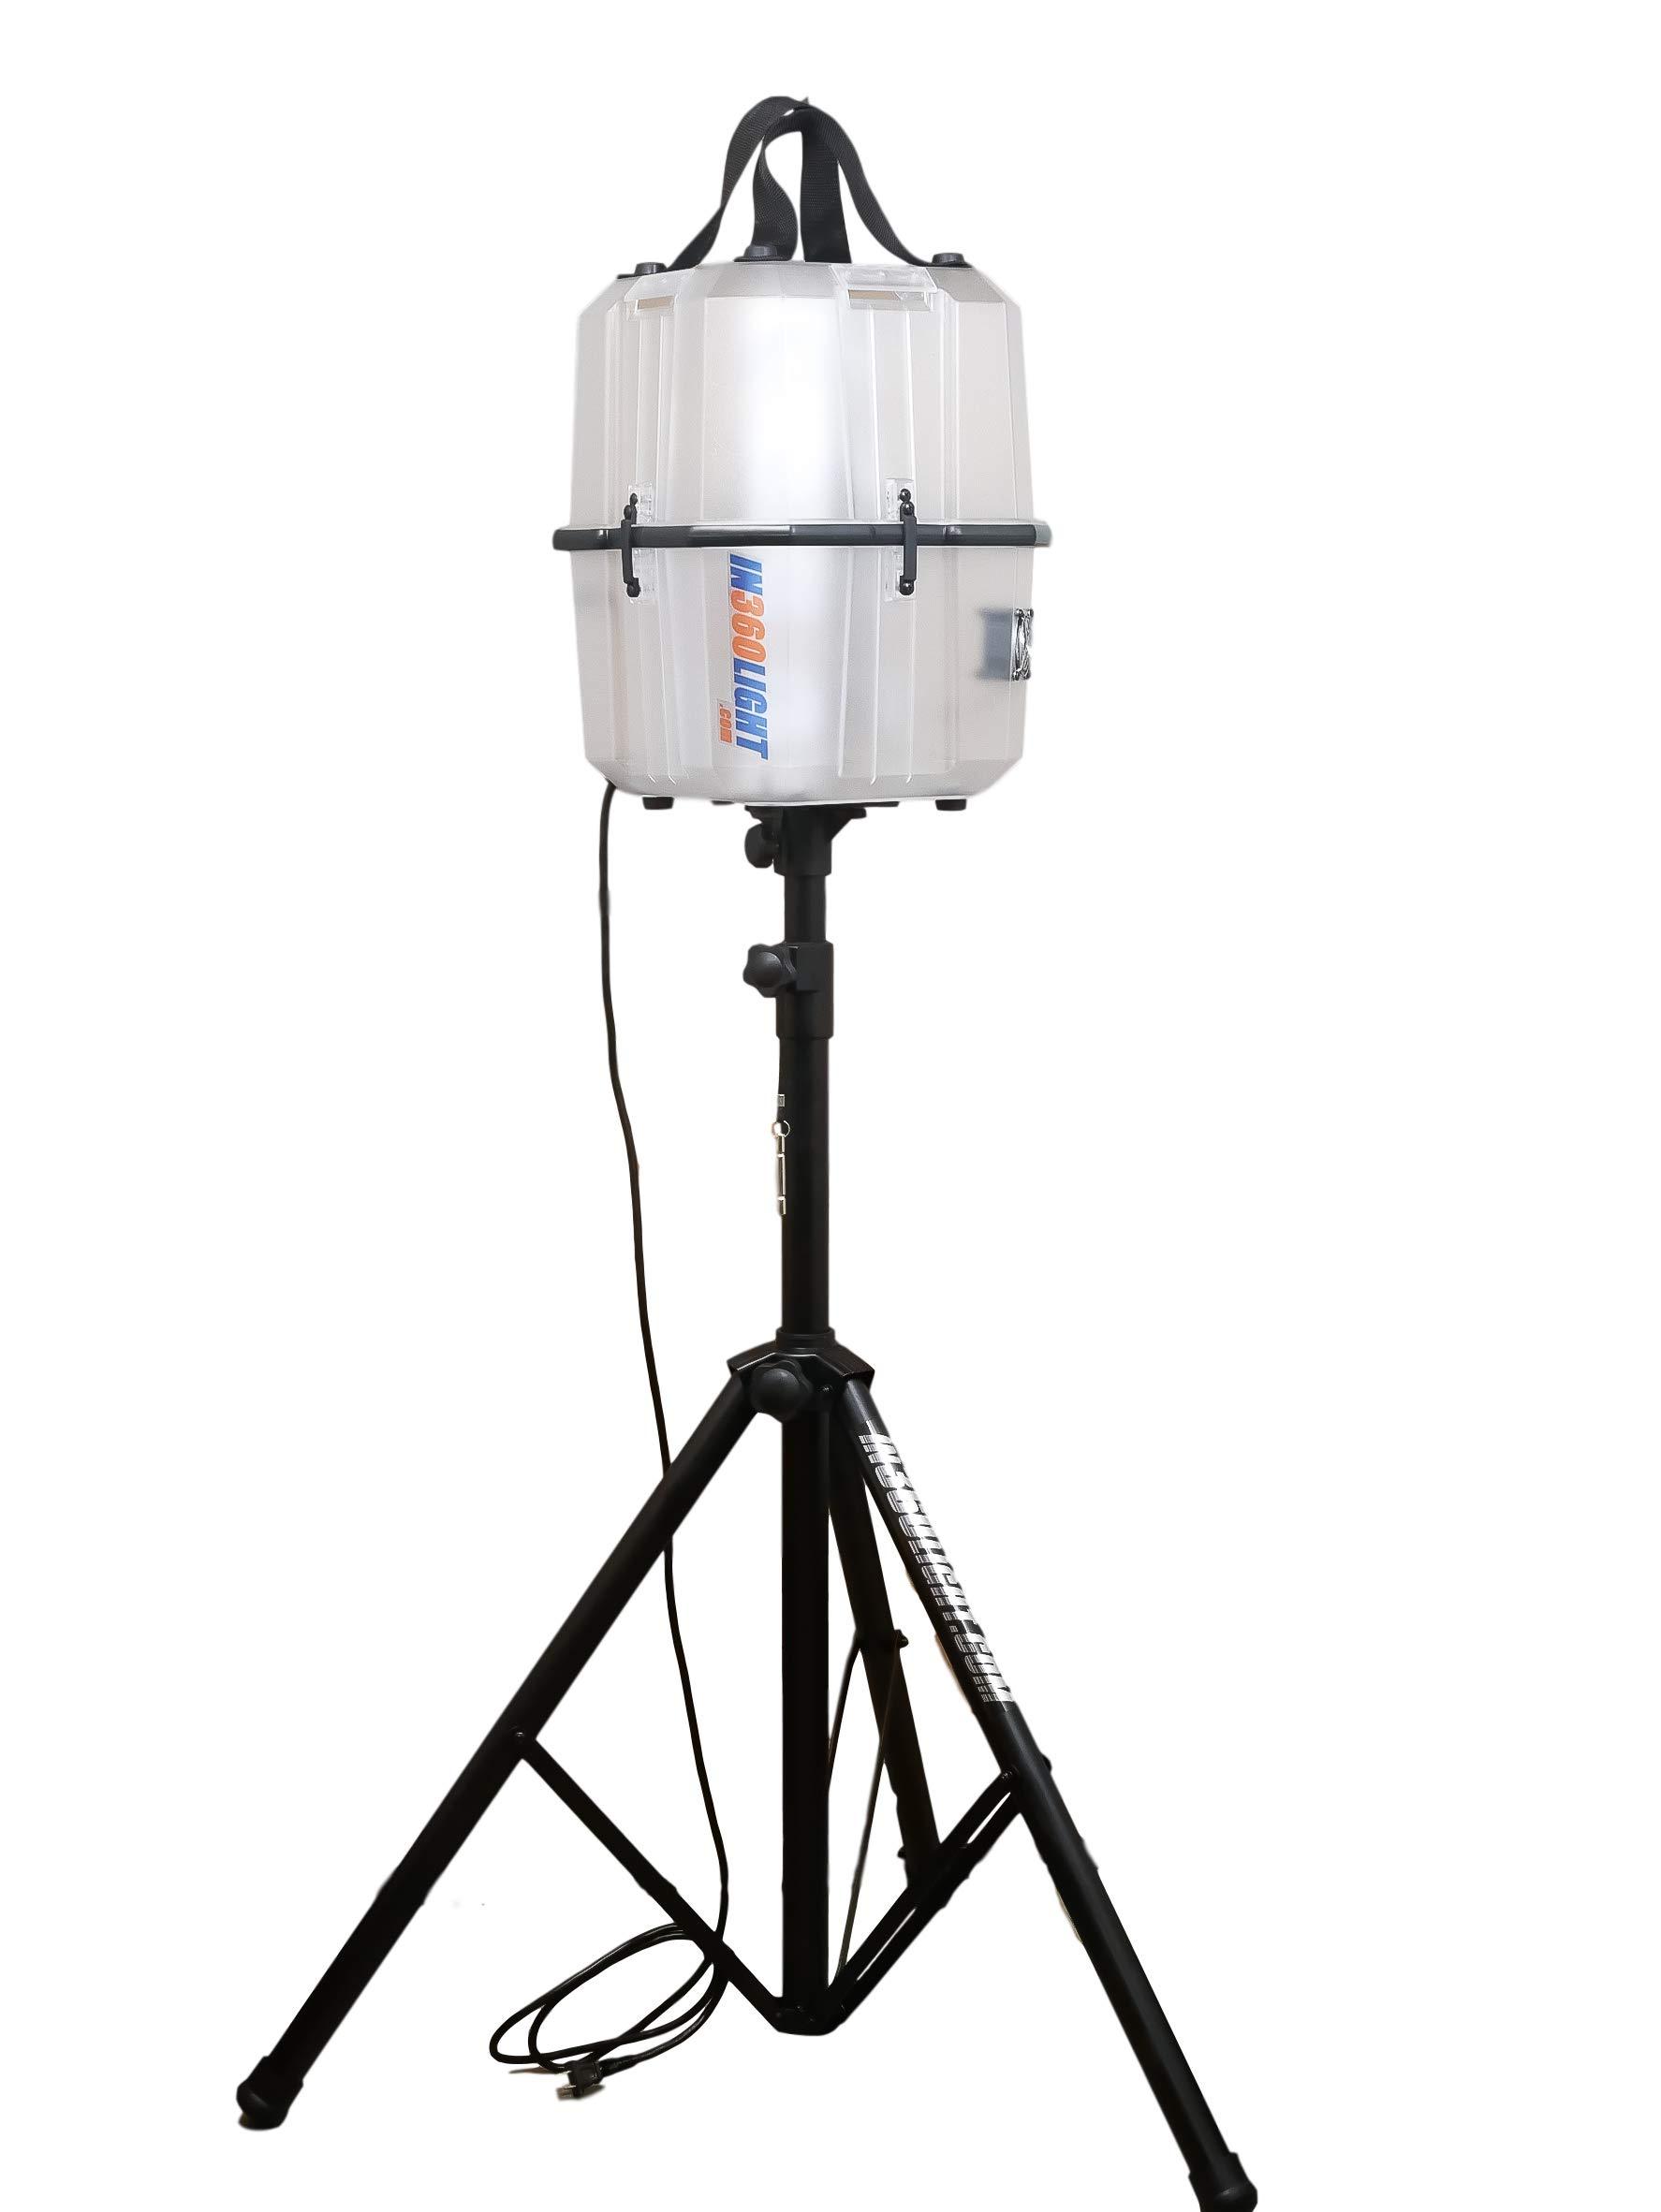 Portable LED Work Light 20,000 Lumens